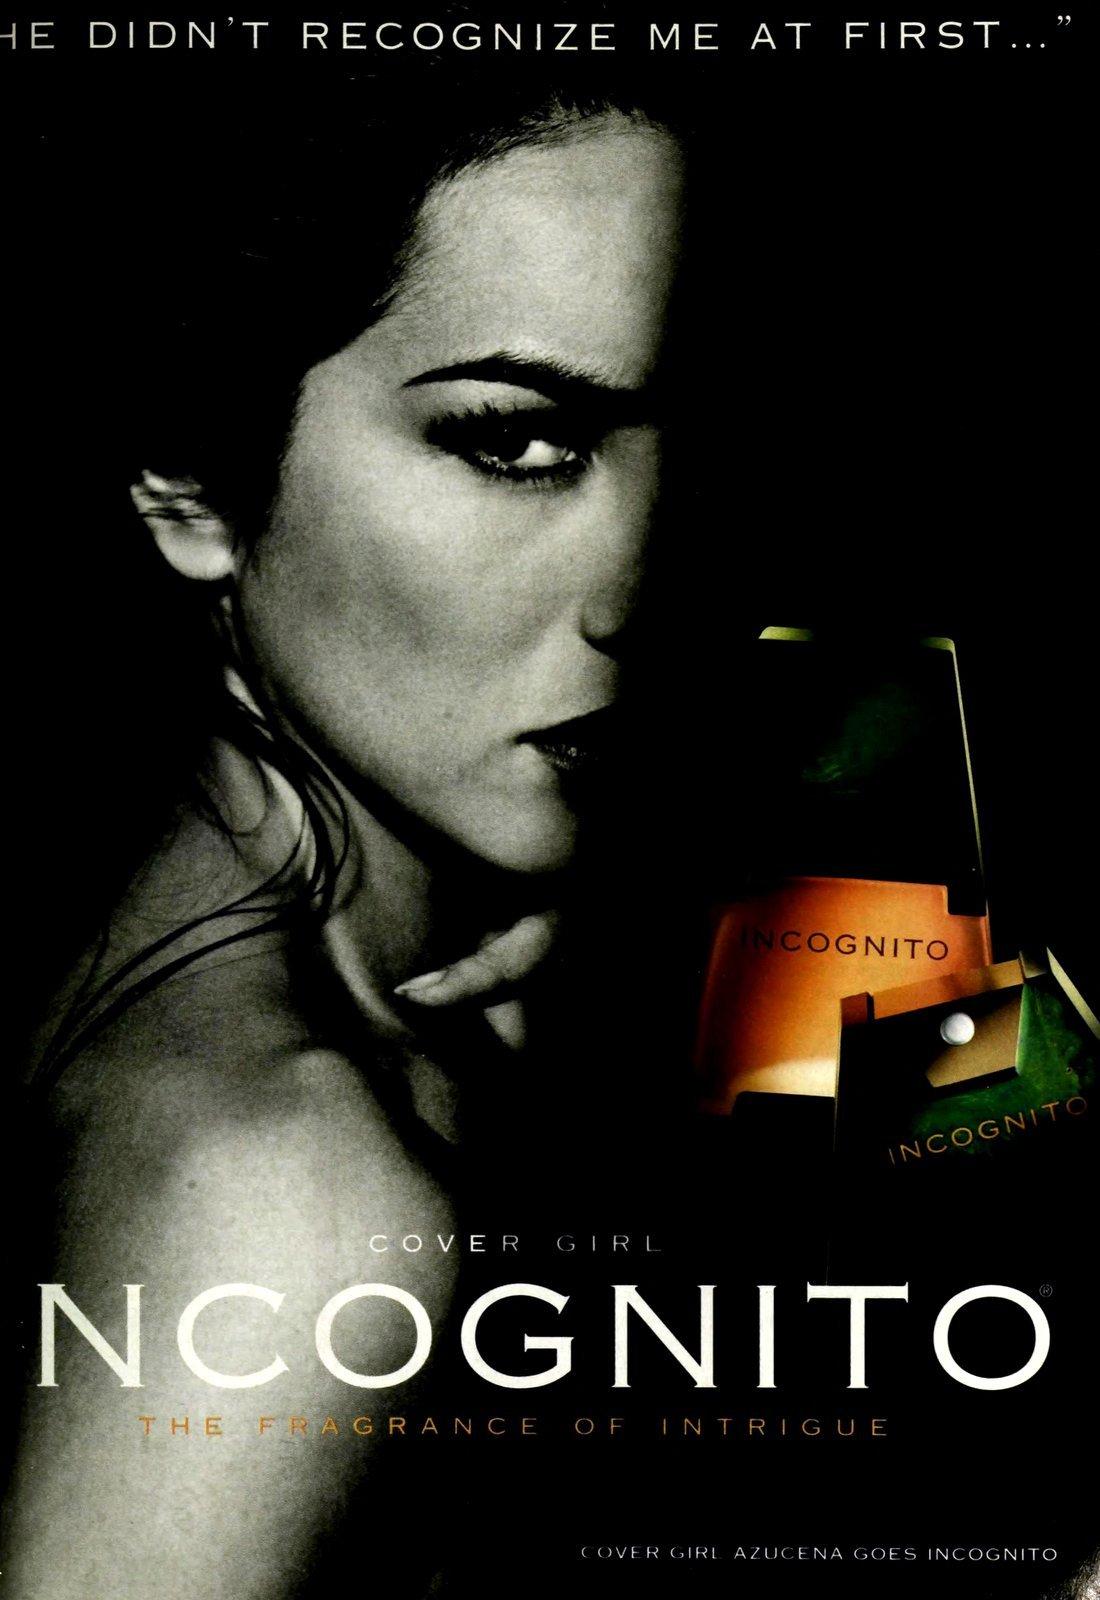 Incognito perfume from Cover Girl (1993) at ClickAmericana.com